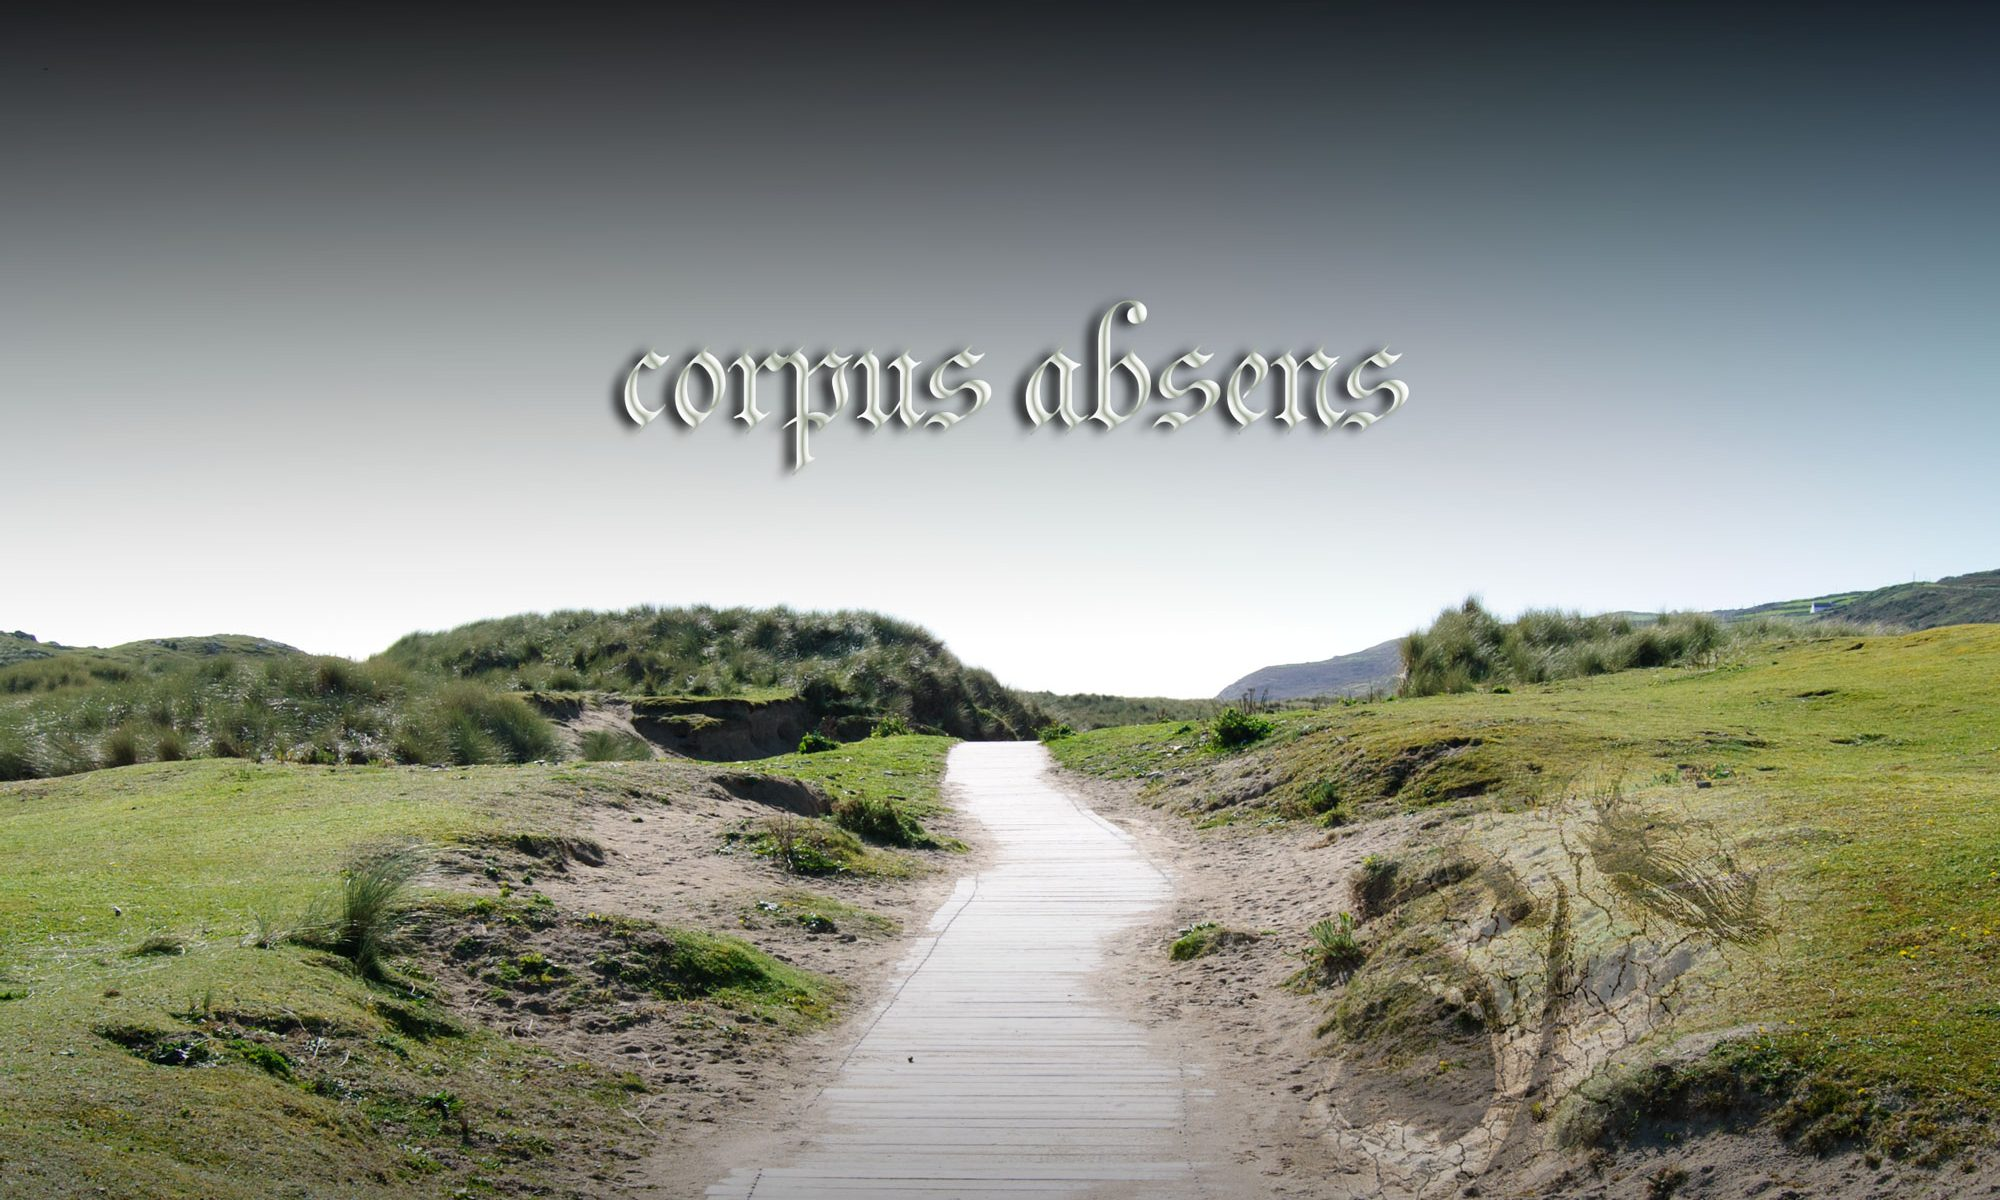 corpus absens